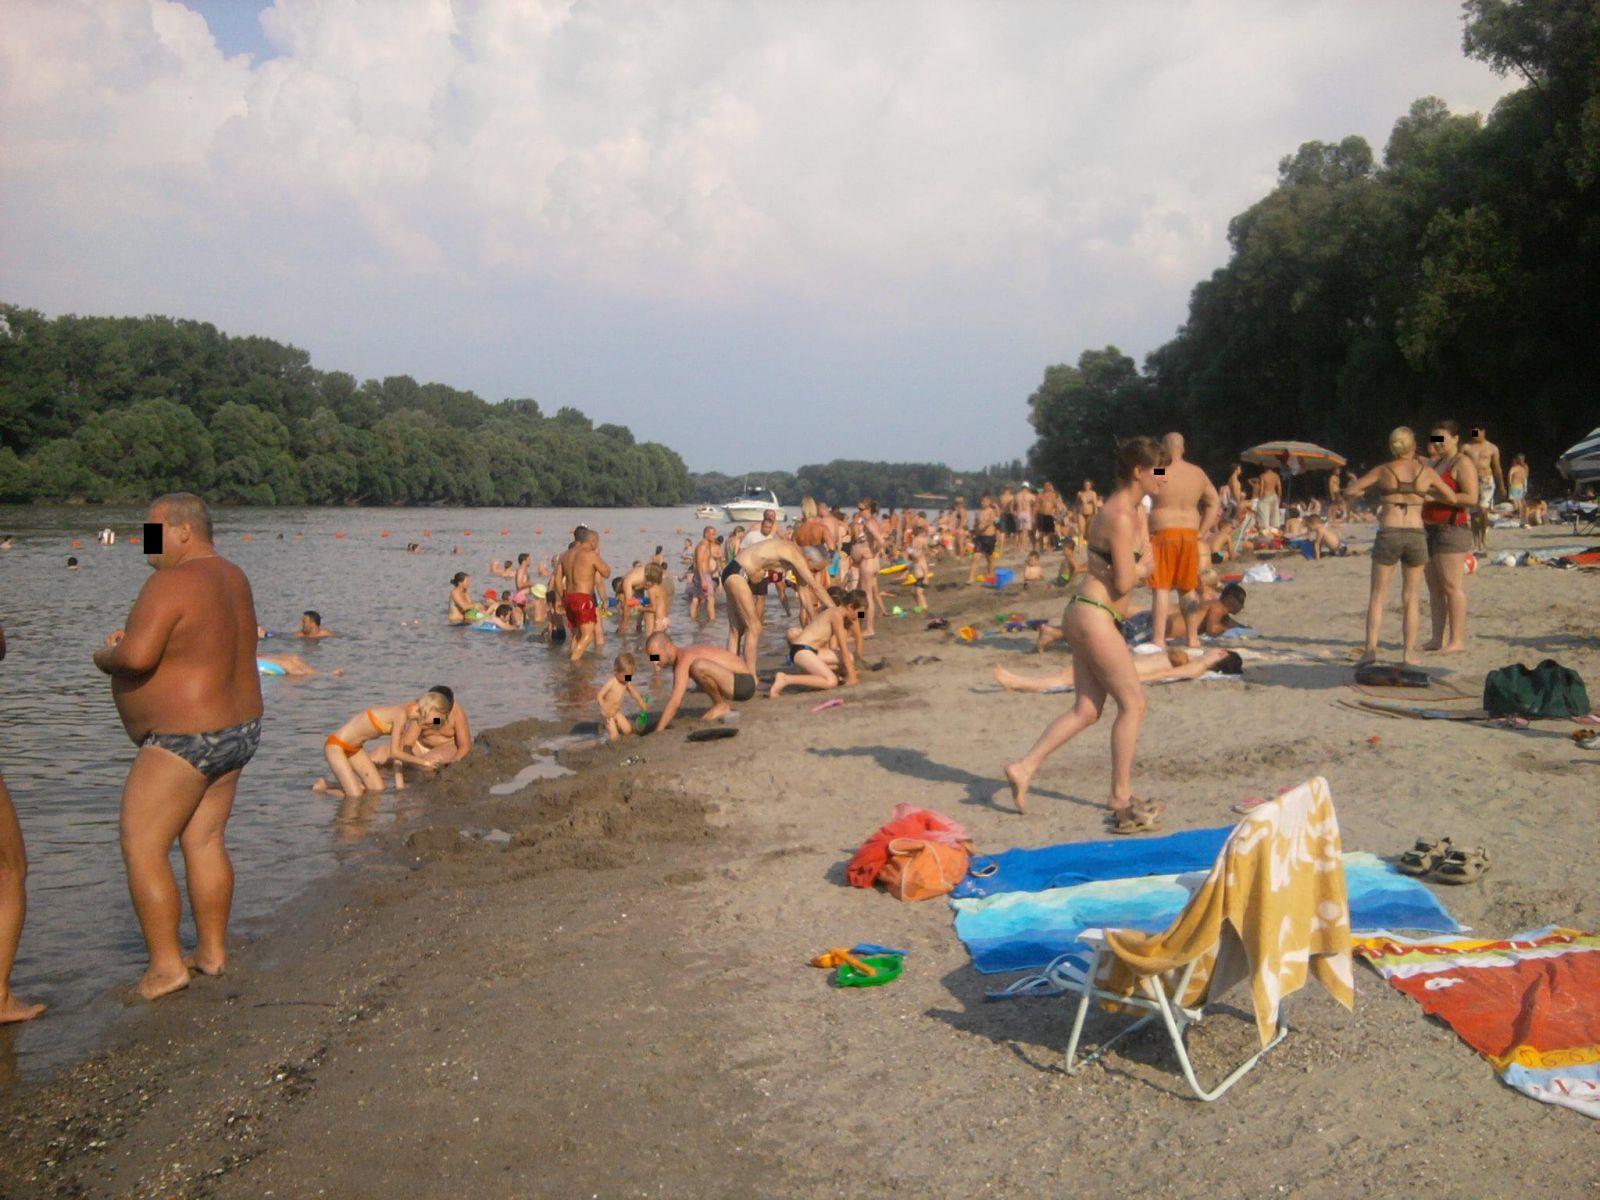 Dunabogdányi strand